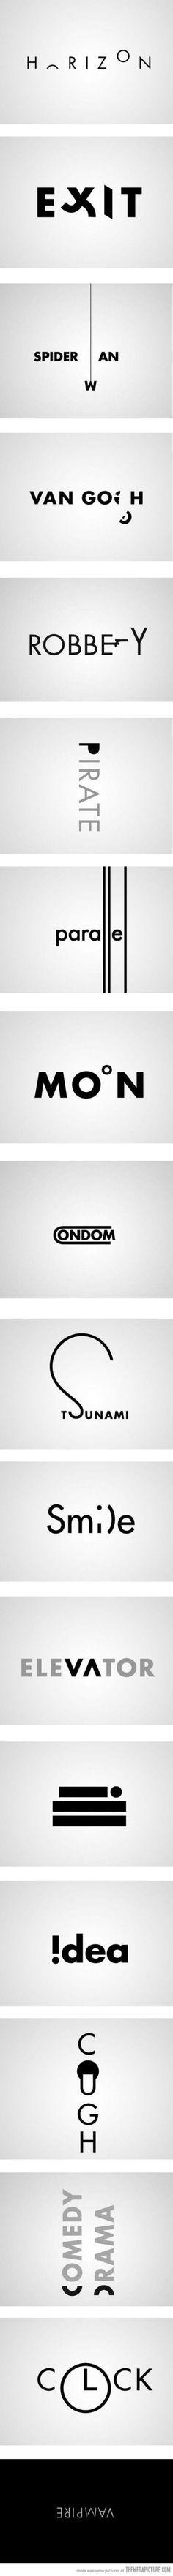 clever-logos-design